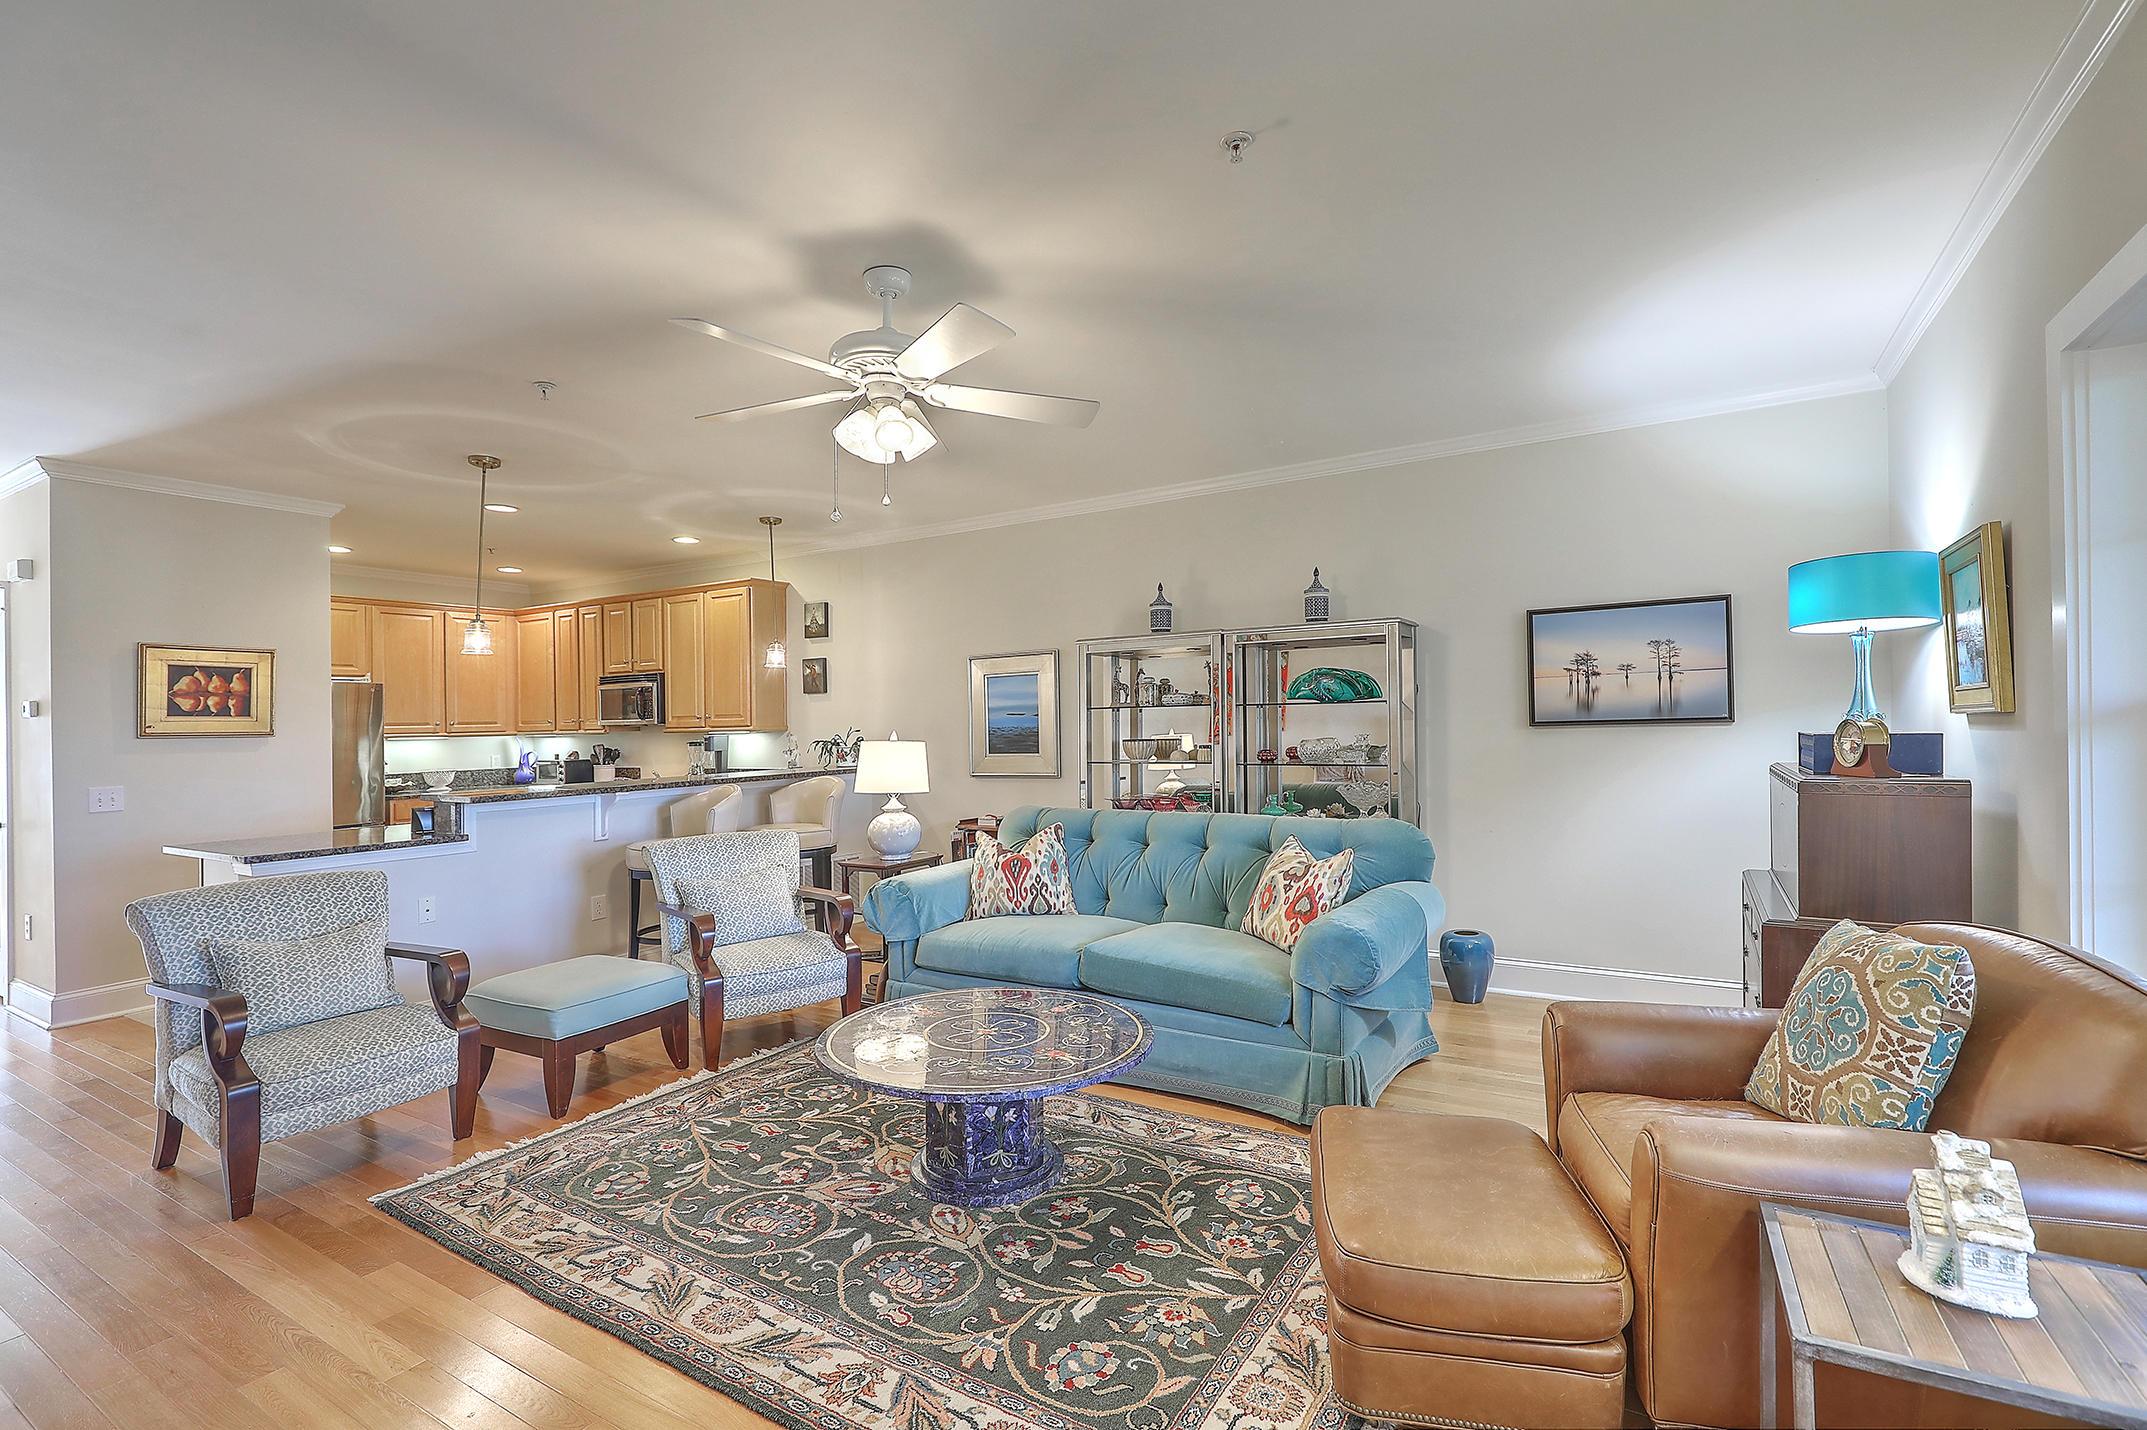 Etiwan Pointe Homes For Sale - 124 Winding Creek, Mount Pleasant, SC - 31